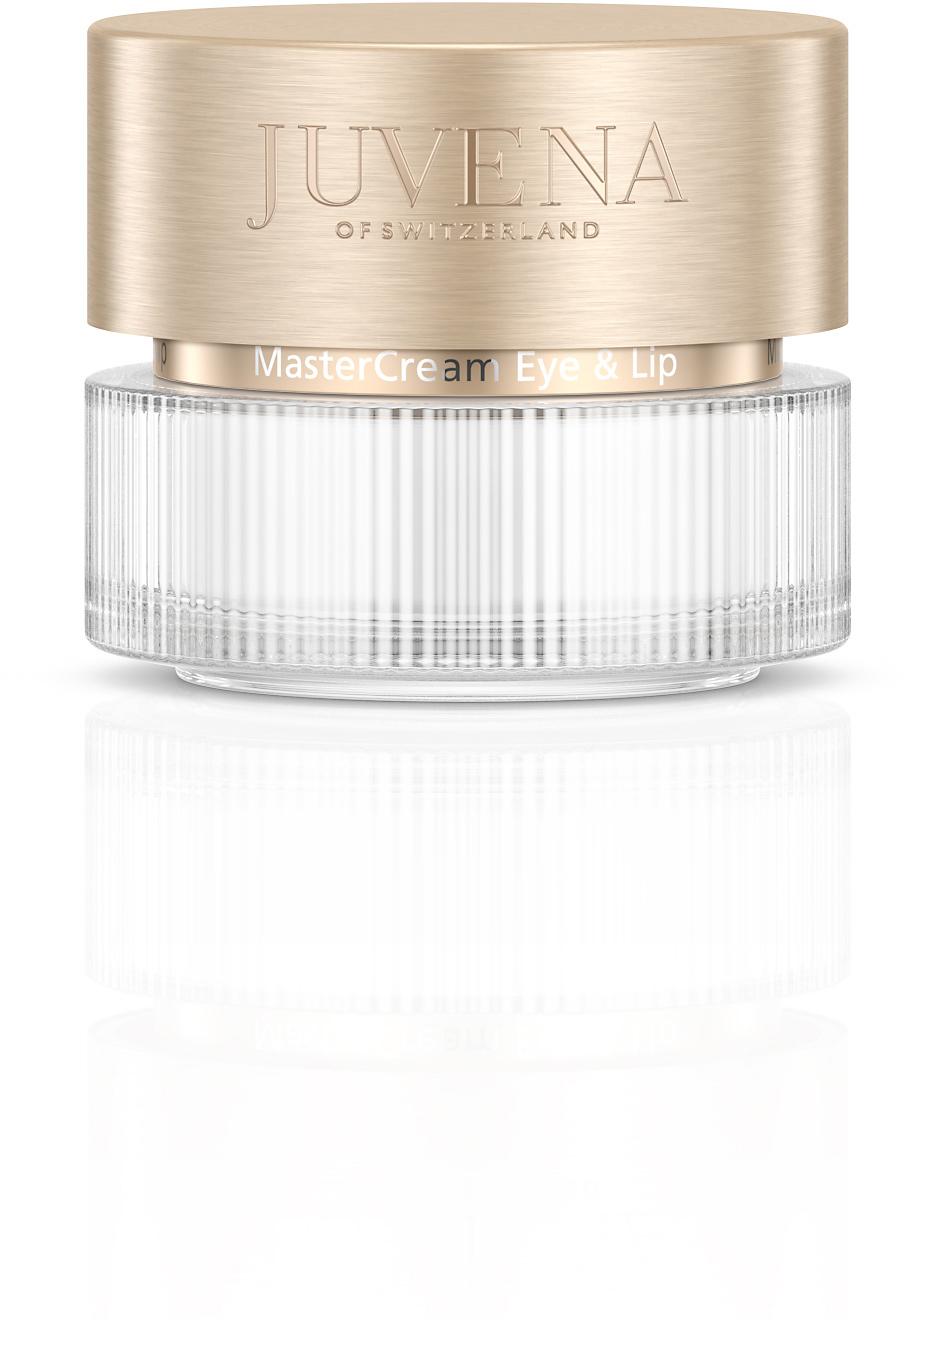 Juvena Mastercaviar Eye & Lip Cream 20ml